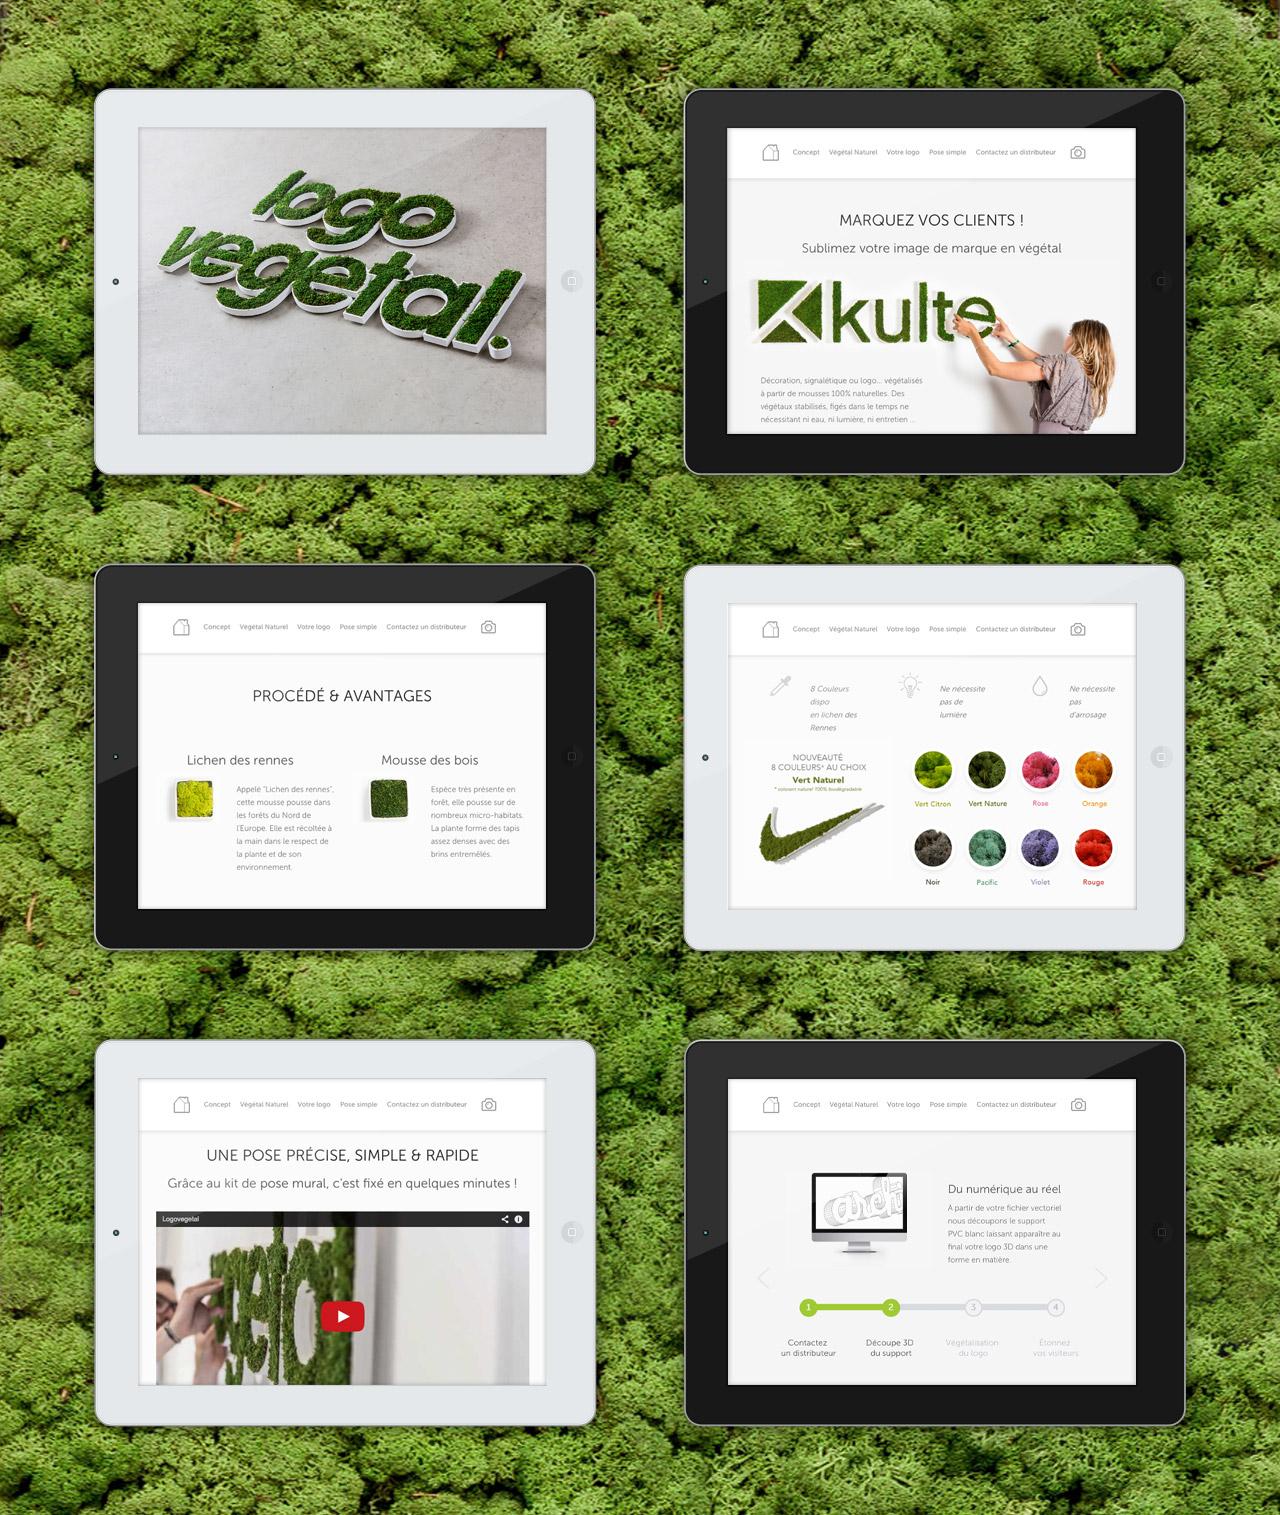 logo-vegetal-site-tablette-responsive-design-creation-communication-caconcept-alexis-cretin-graphiste